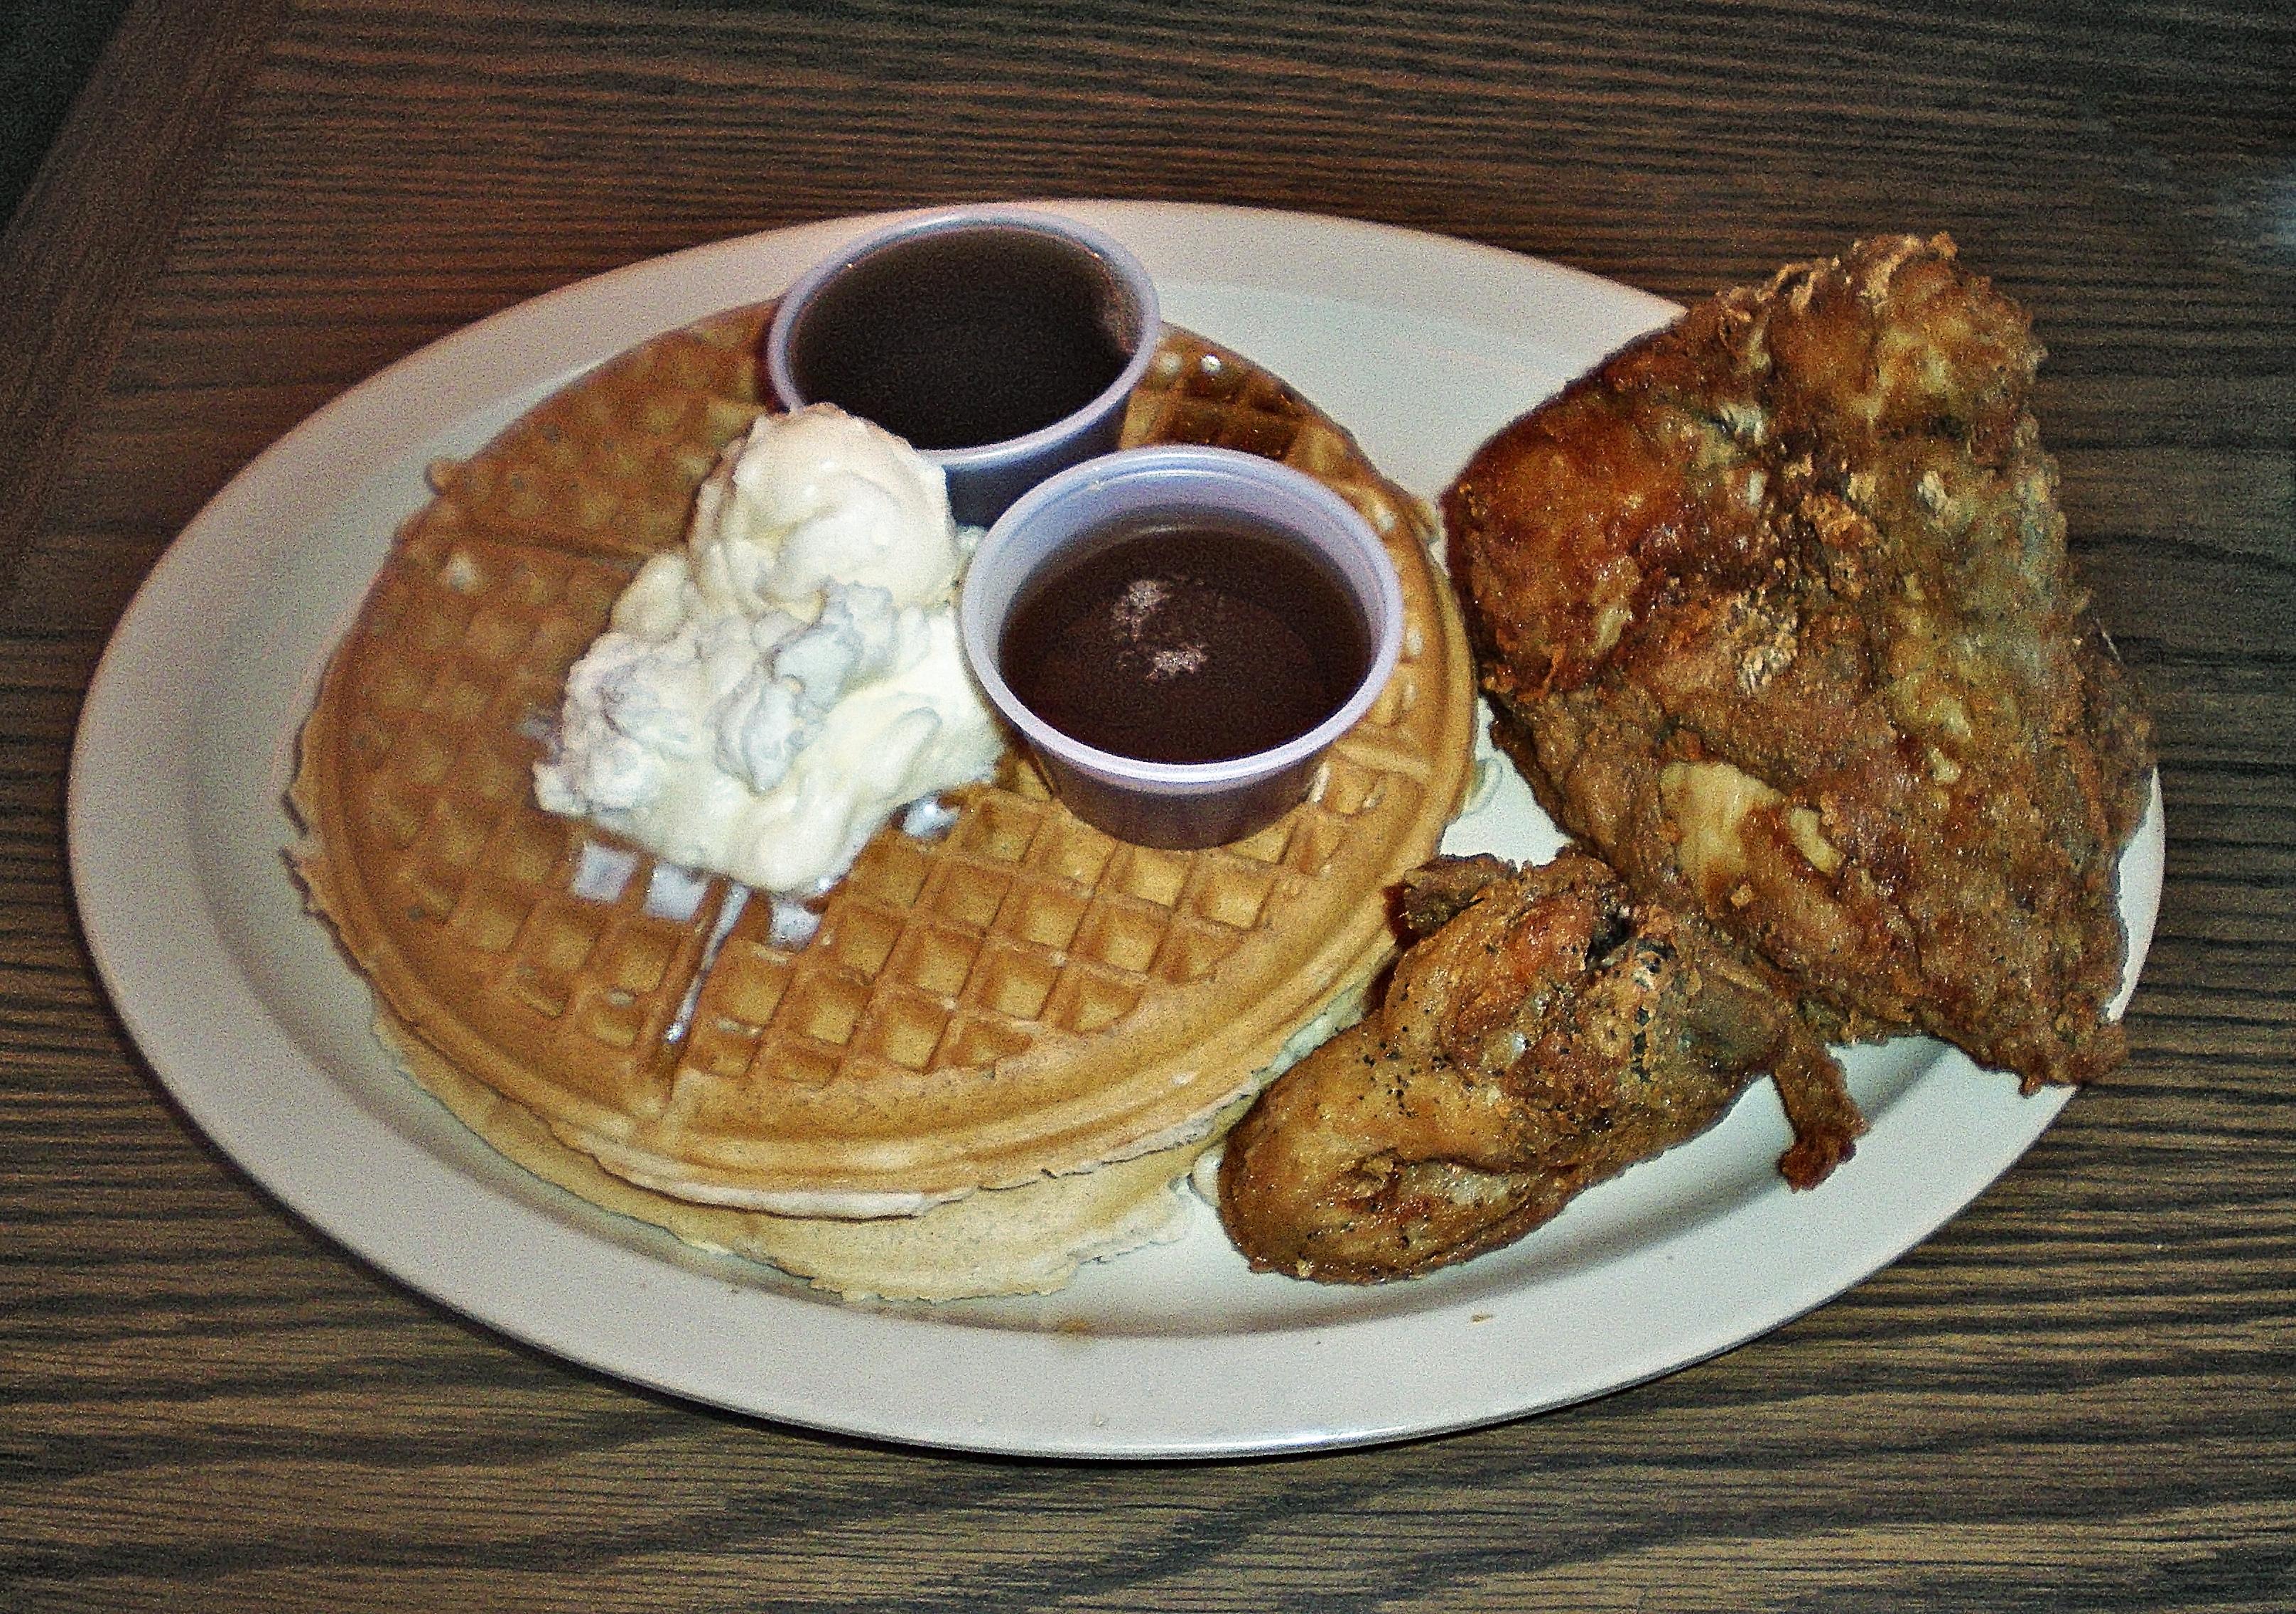 Roscoe S Chicken And Waffles Long Beach Jazz Club